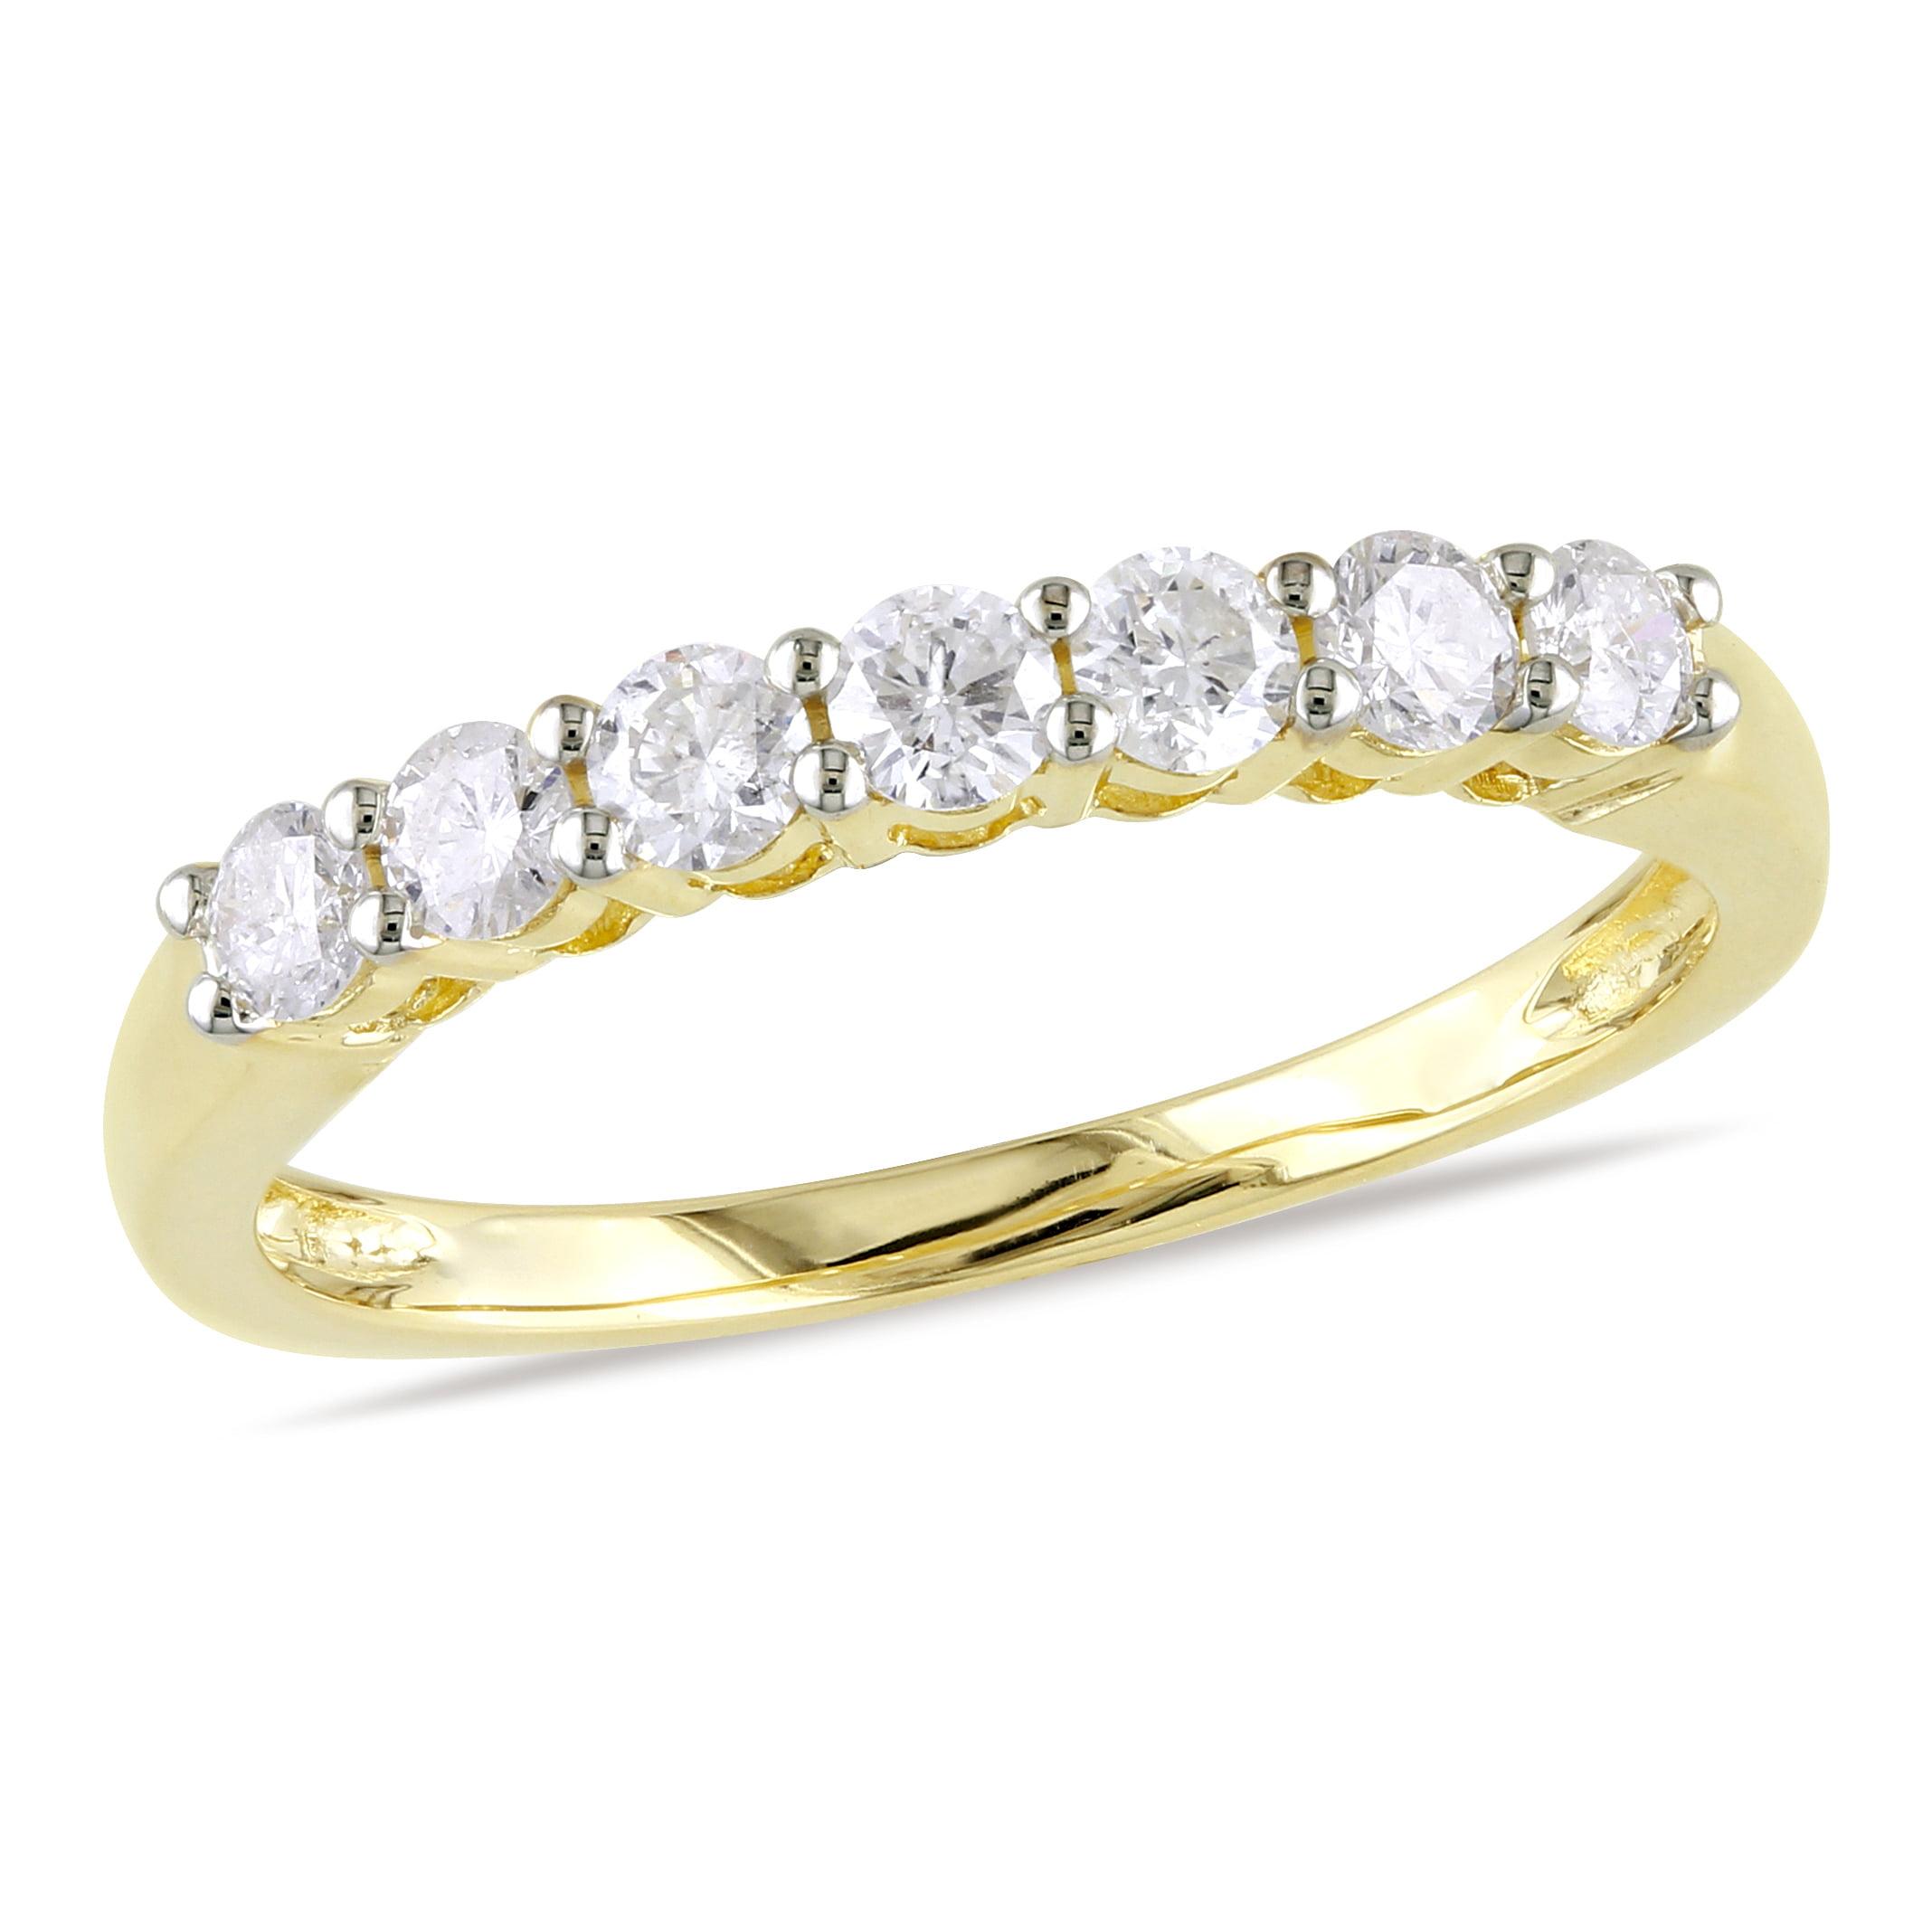 Miabella 1/2 Carat T.W. Diamond 10kt Yellow Gold Semi-Eternity Anniversary Ring